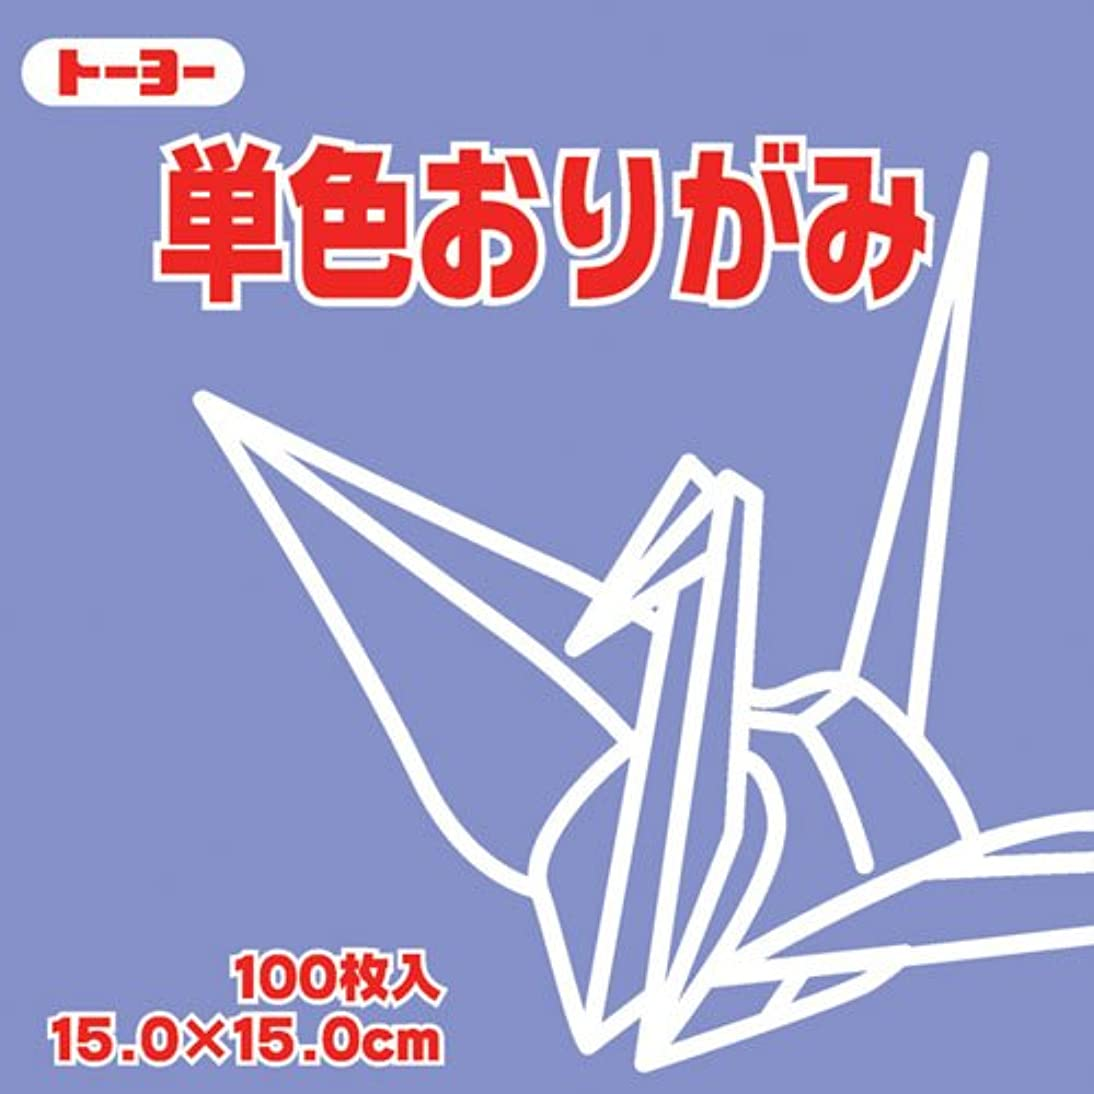 Toyo Origami Paper Single Color - Wisteria Violet - 15cm, 100 Sheets